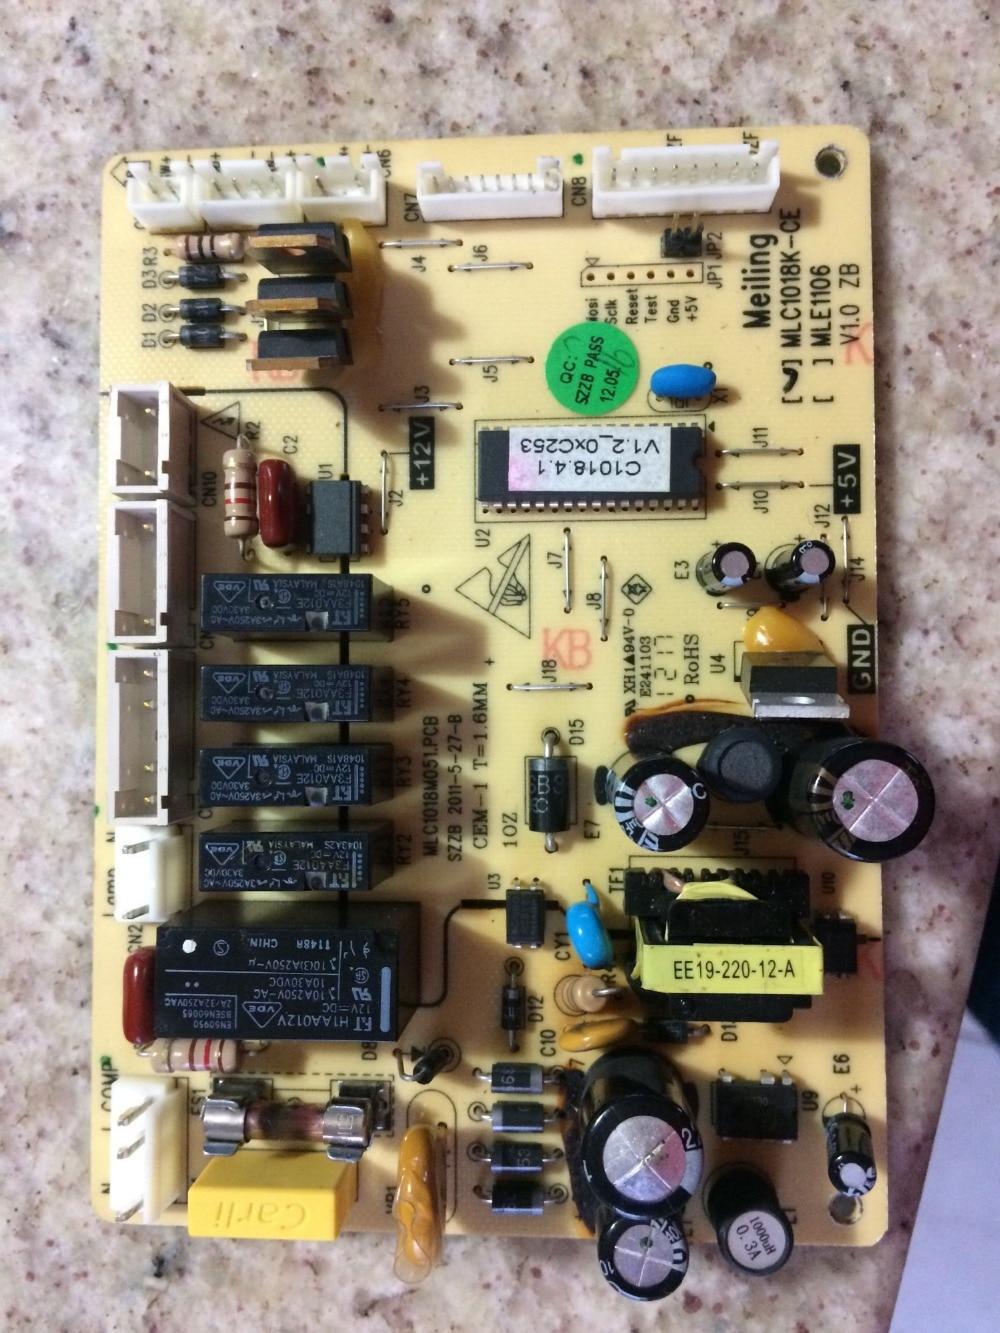 100% Nuovo frigorifero circuit board/MLC1018-CE/MEL1106 invece100% Nuovo frigorifero circuit board/MLC1018-CE/MEL1106 invece